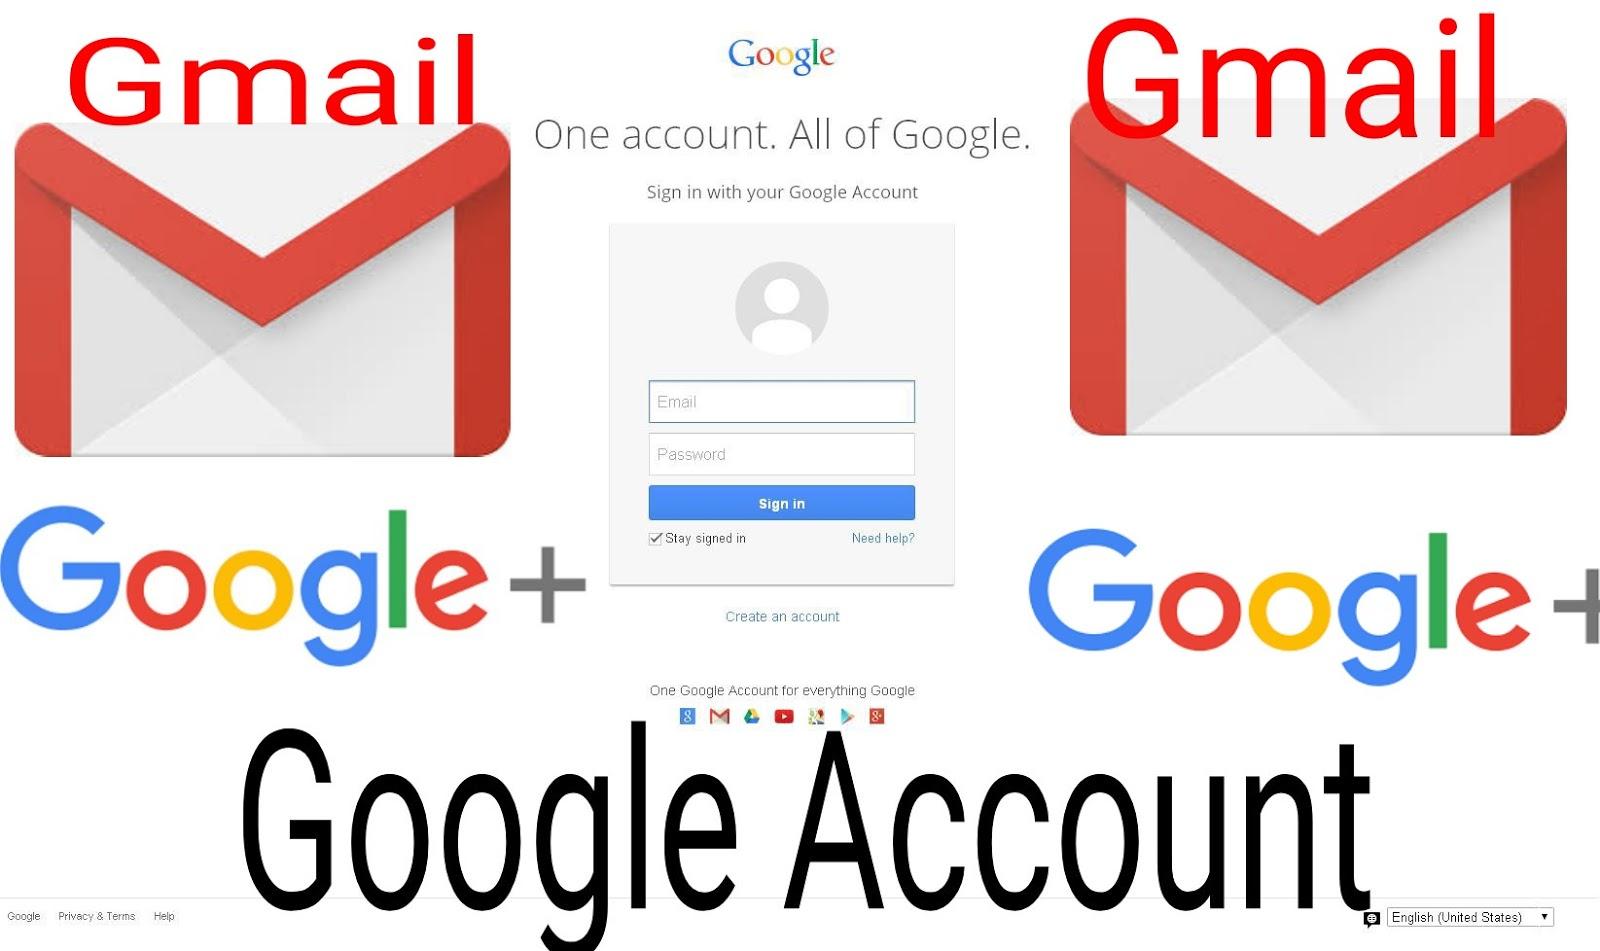 Gmail Login Mail gmail.com - MATHS329